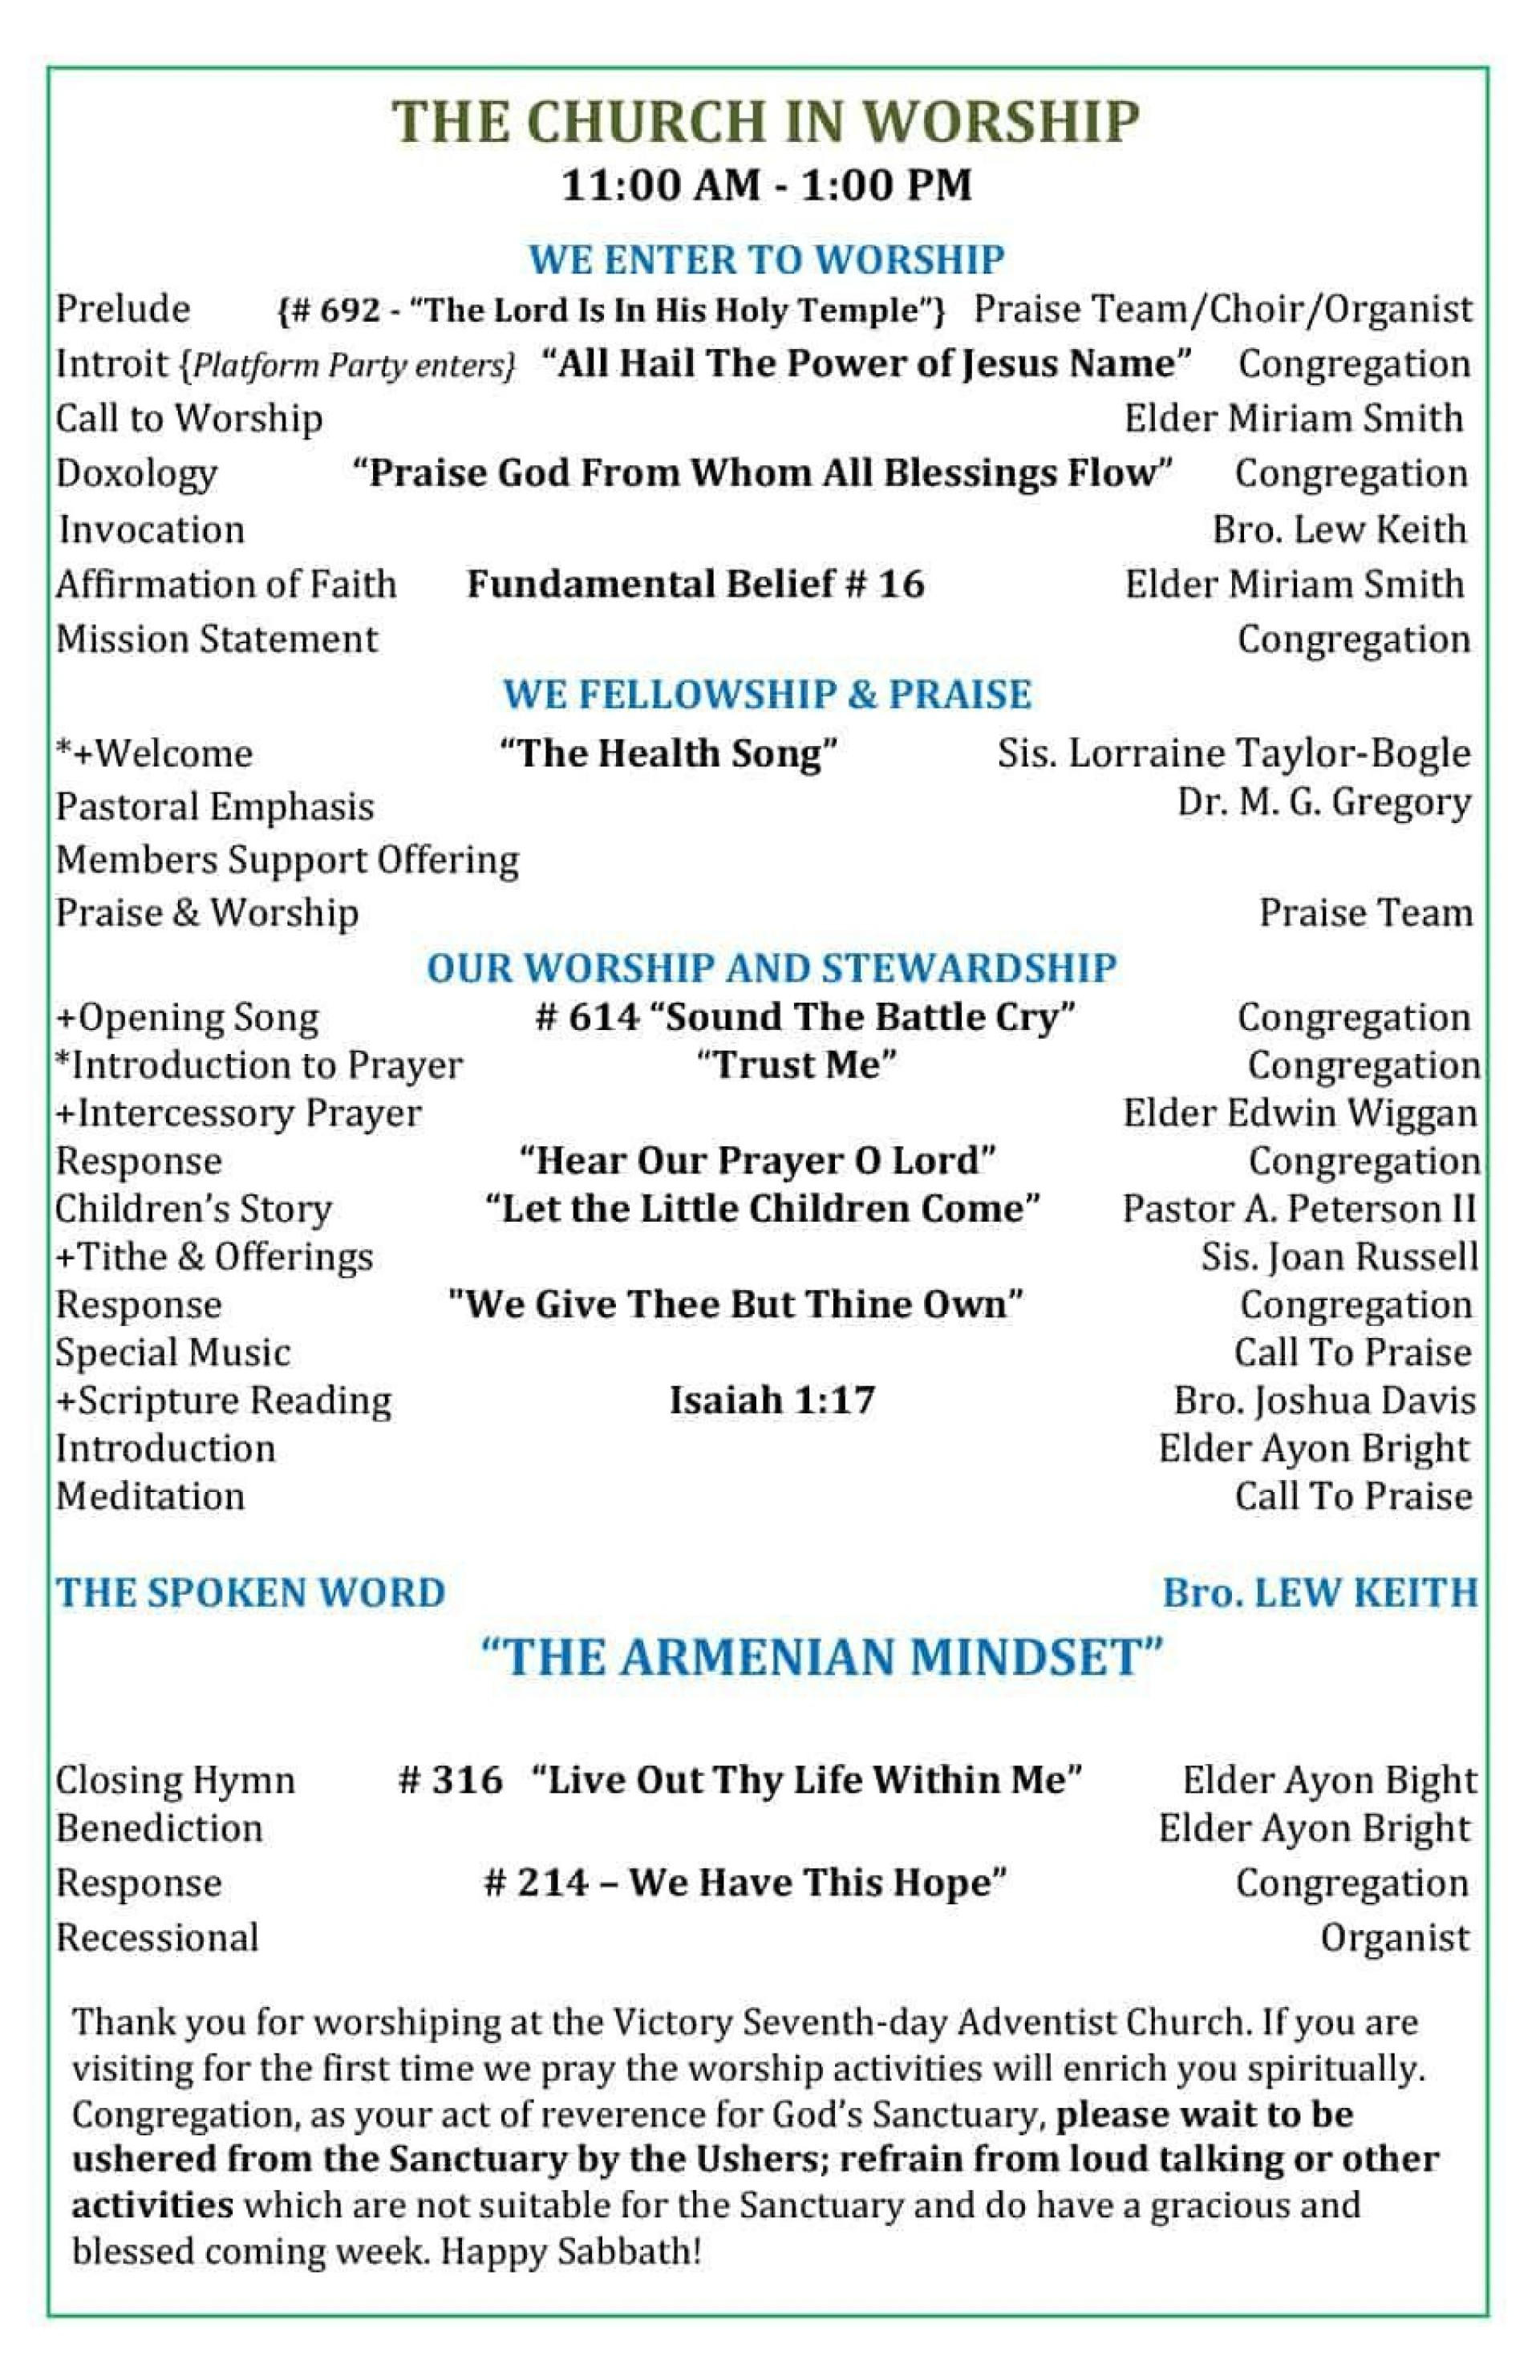 001 Excellent Free Church Program Template Download Concept  Downloads1920